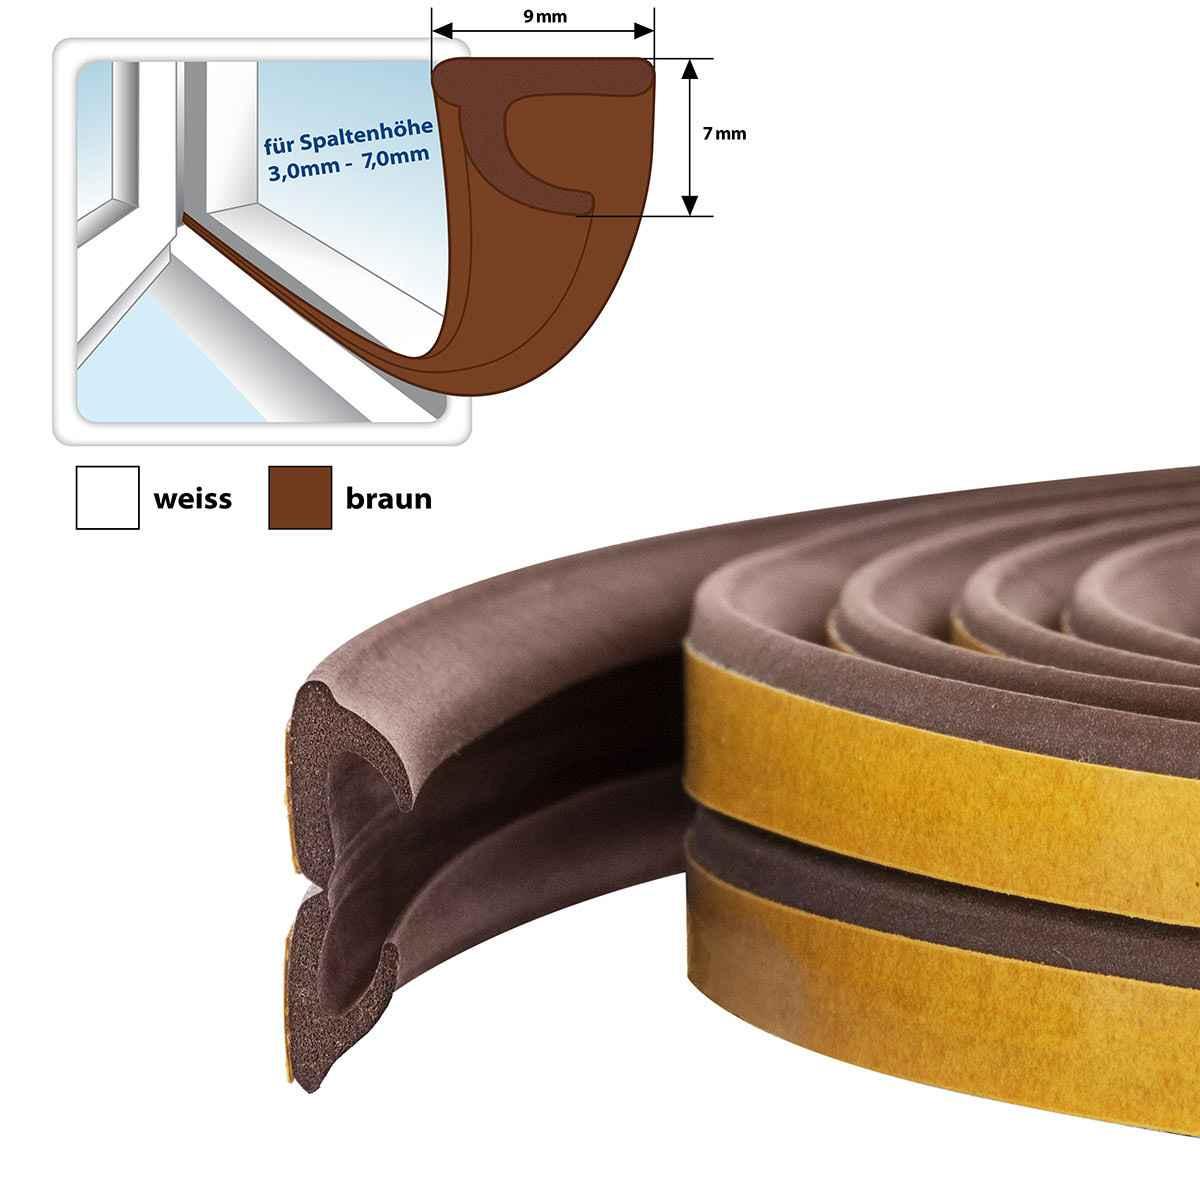 fensterdichtung gummidichtung selbstklebend braun v profil. Black Bedroom Furniture Sets. Home Design Ideas